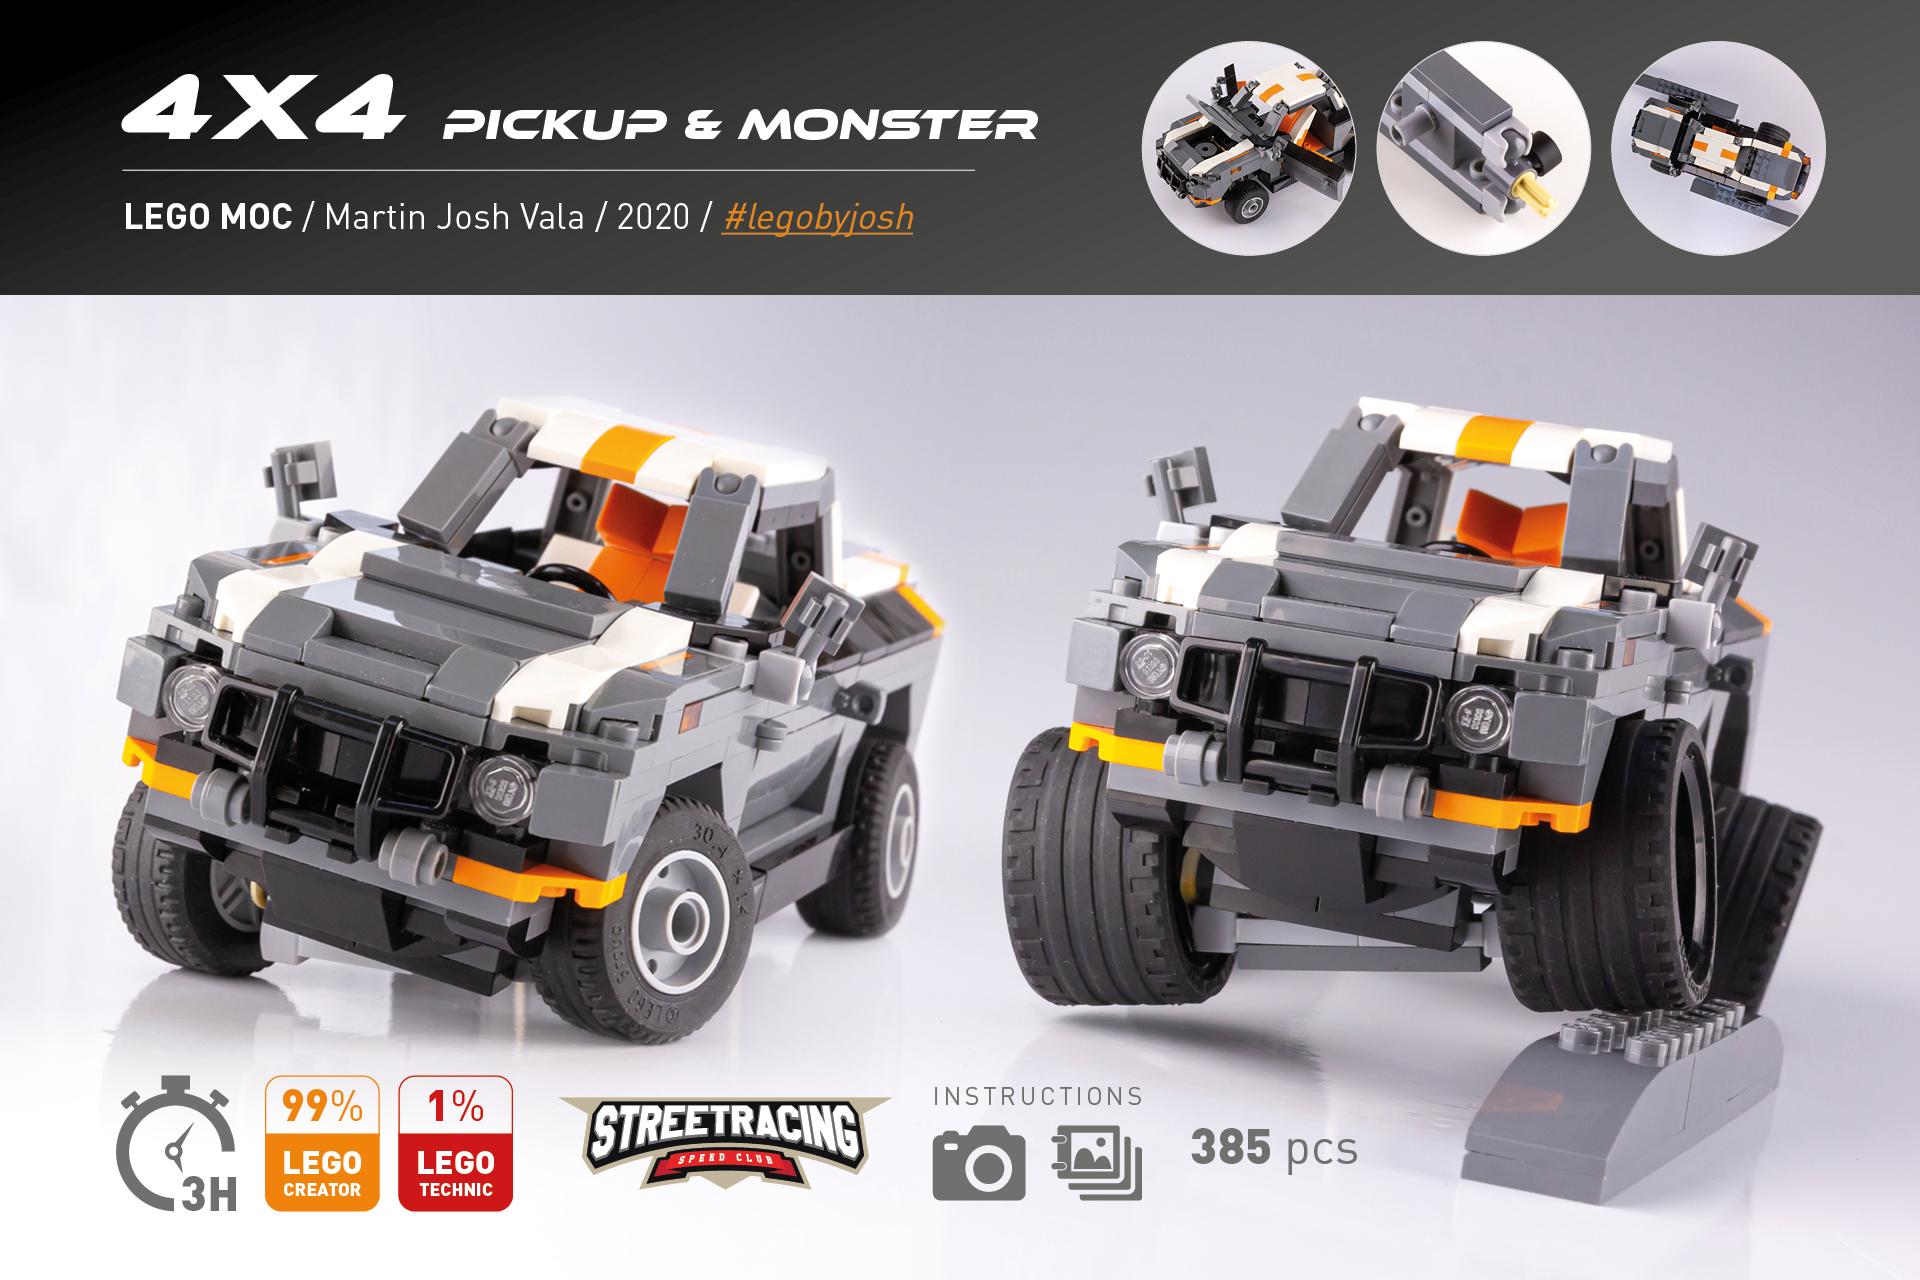 Lego MOC Pickup 4x4 by Martin Josh Vala